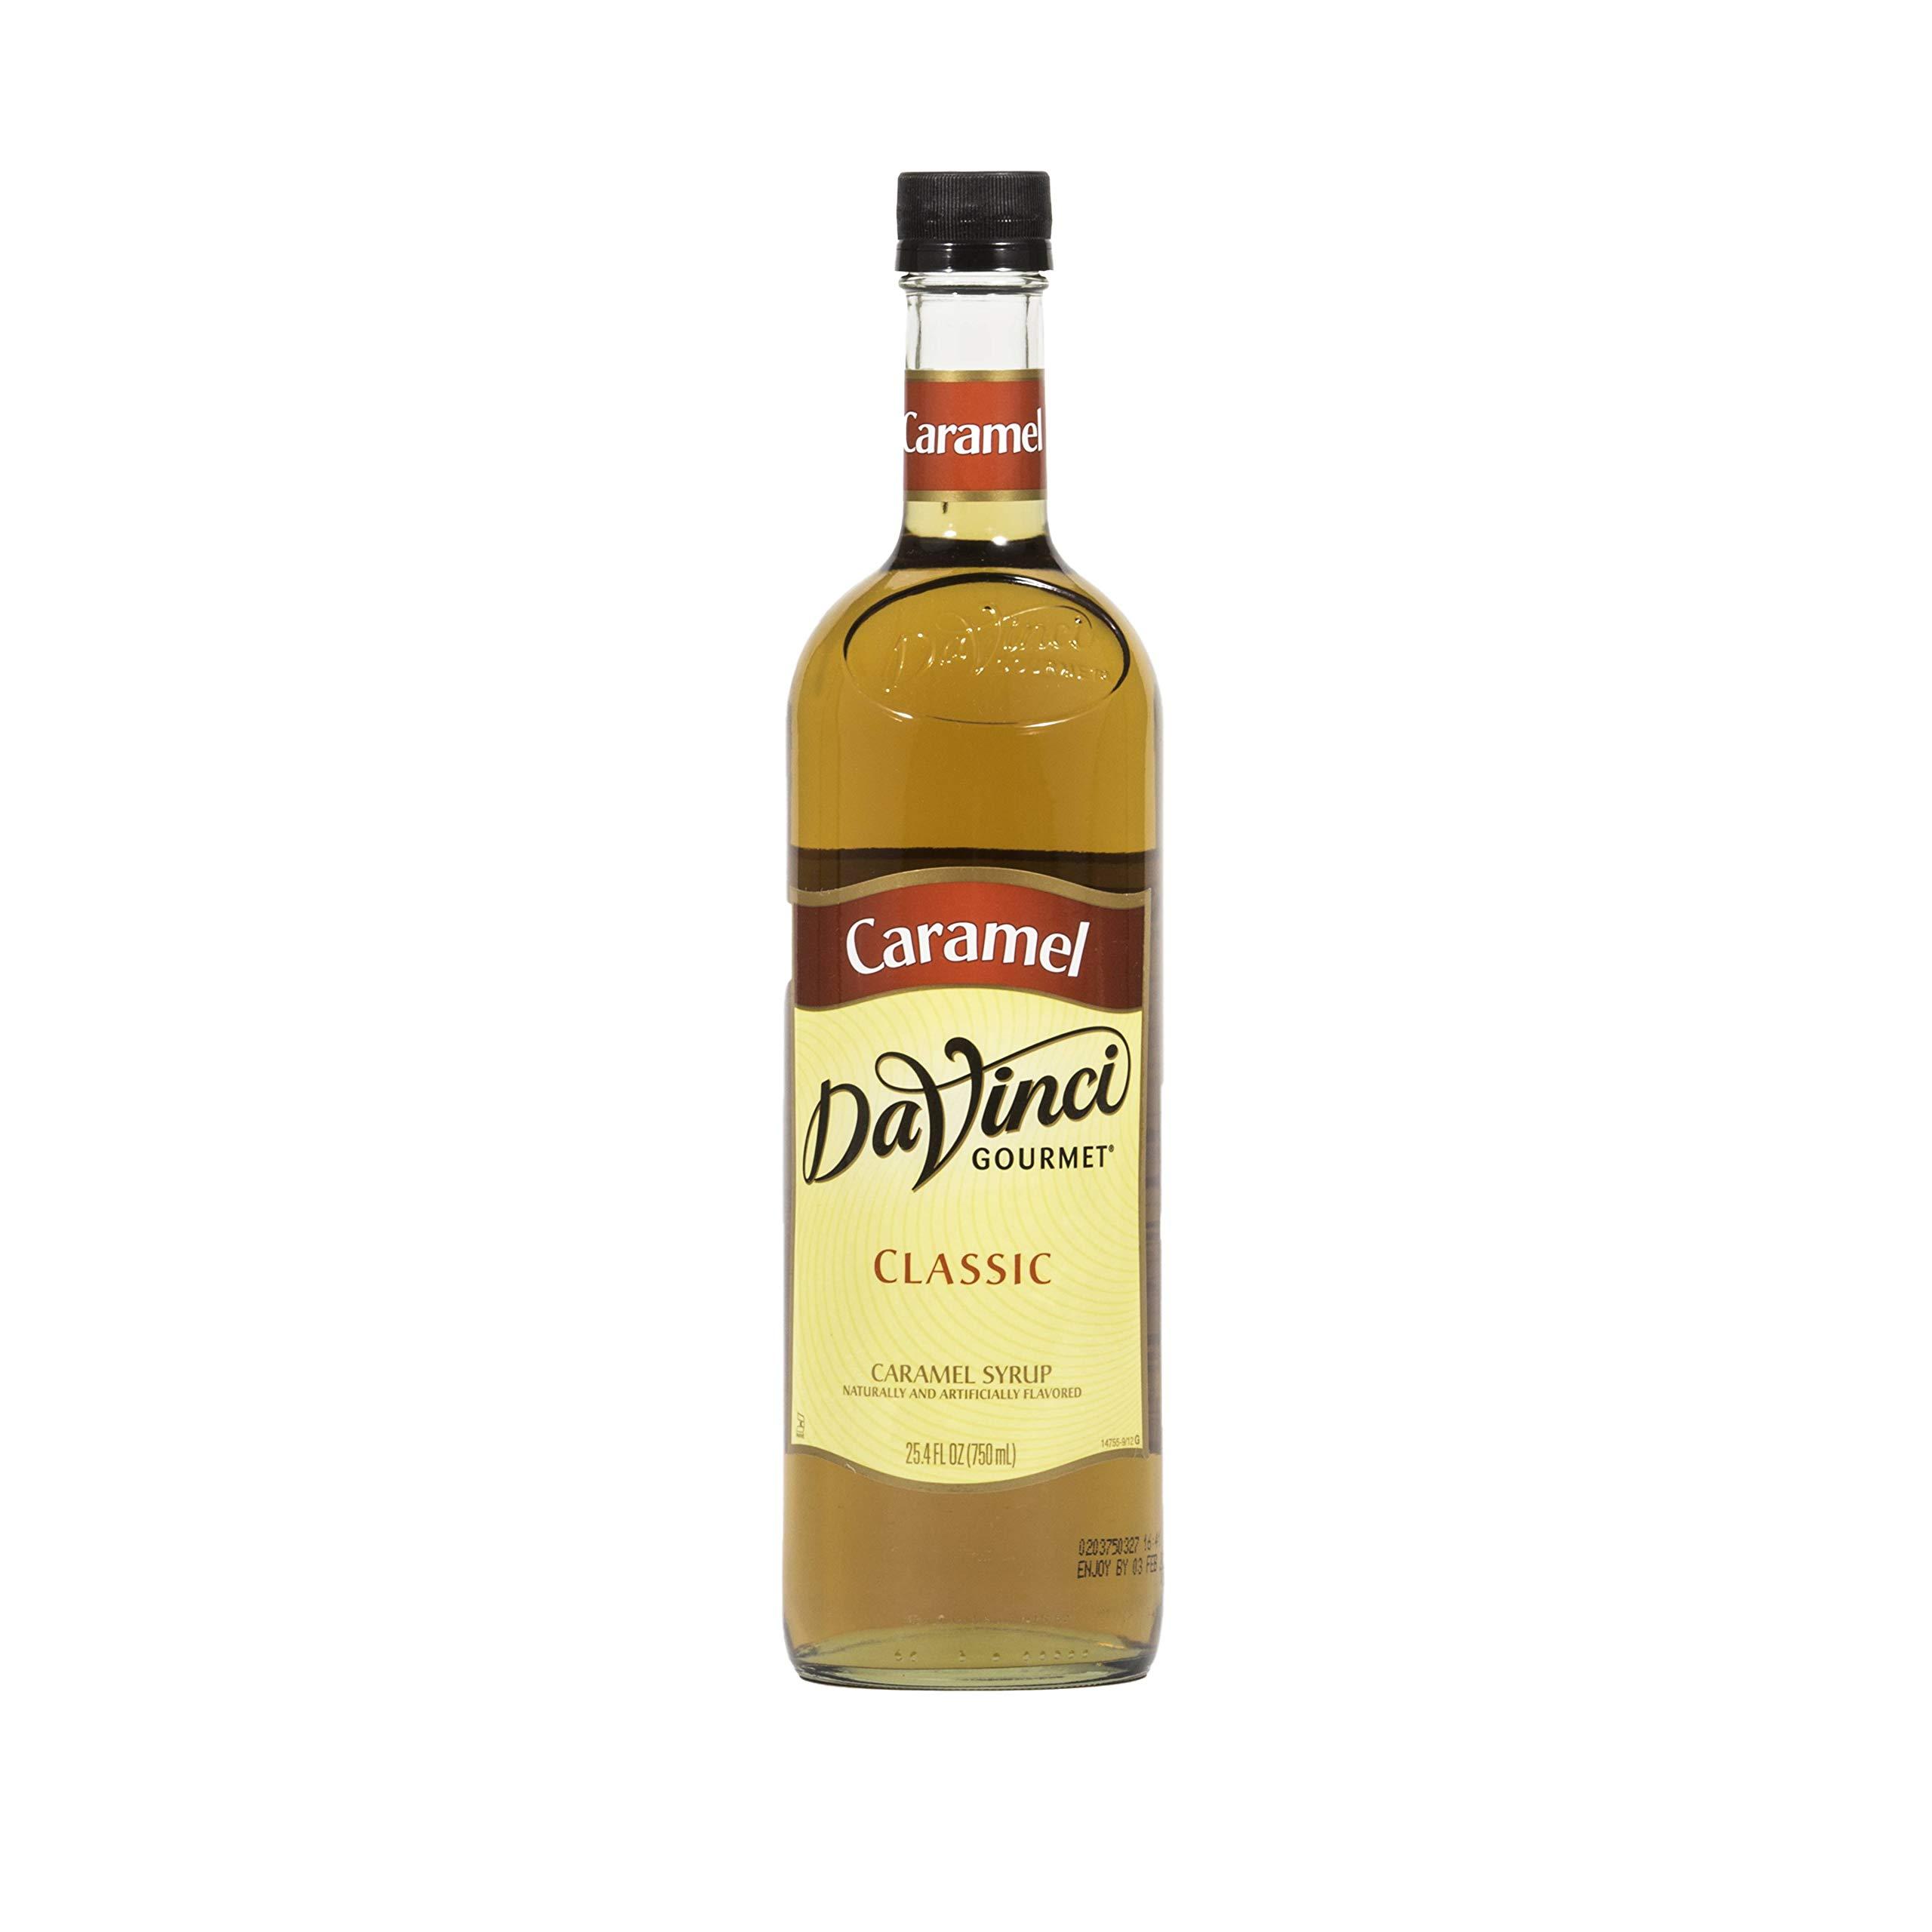 DaVinci Classic Caramel Syrup - 750ml Bottle (Case of 12)